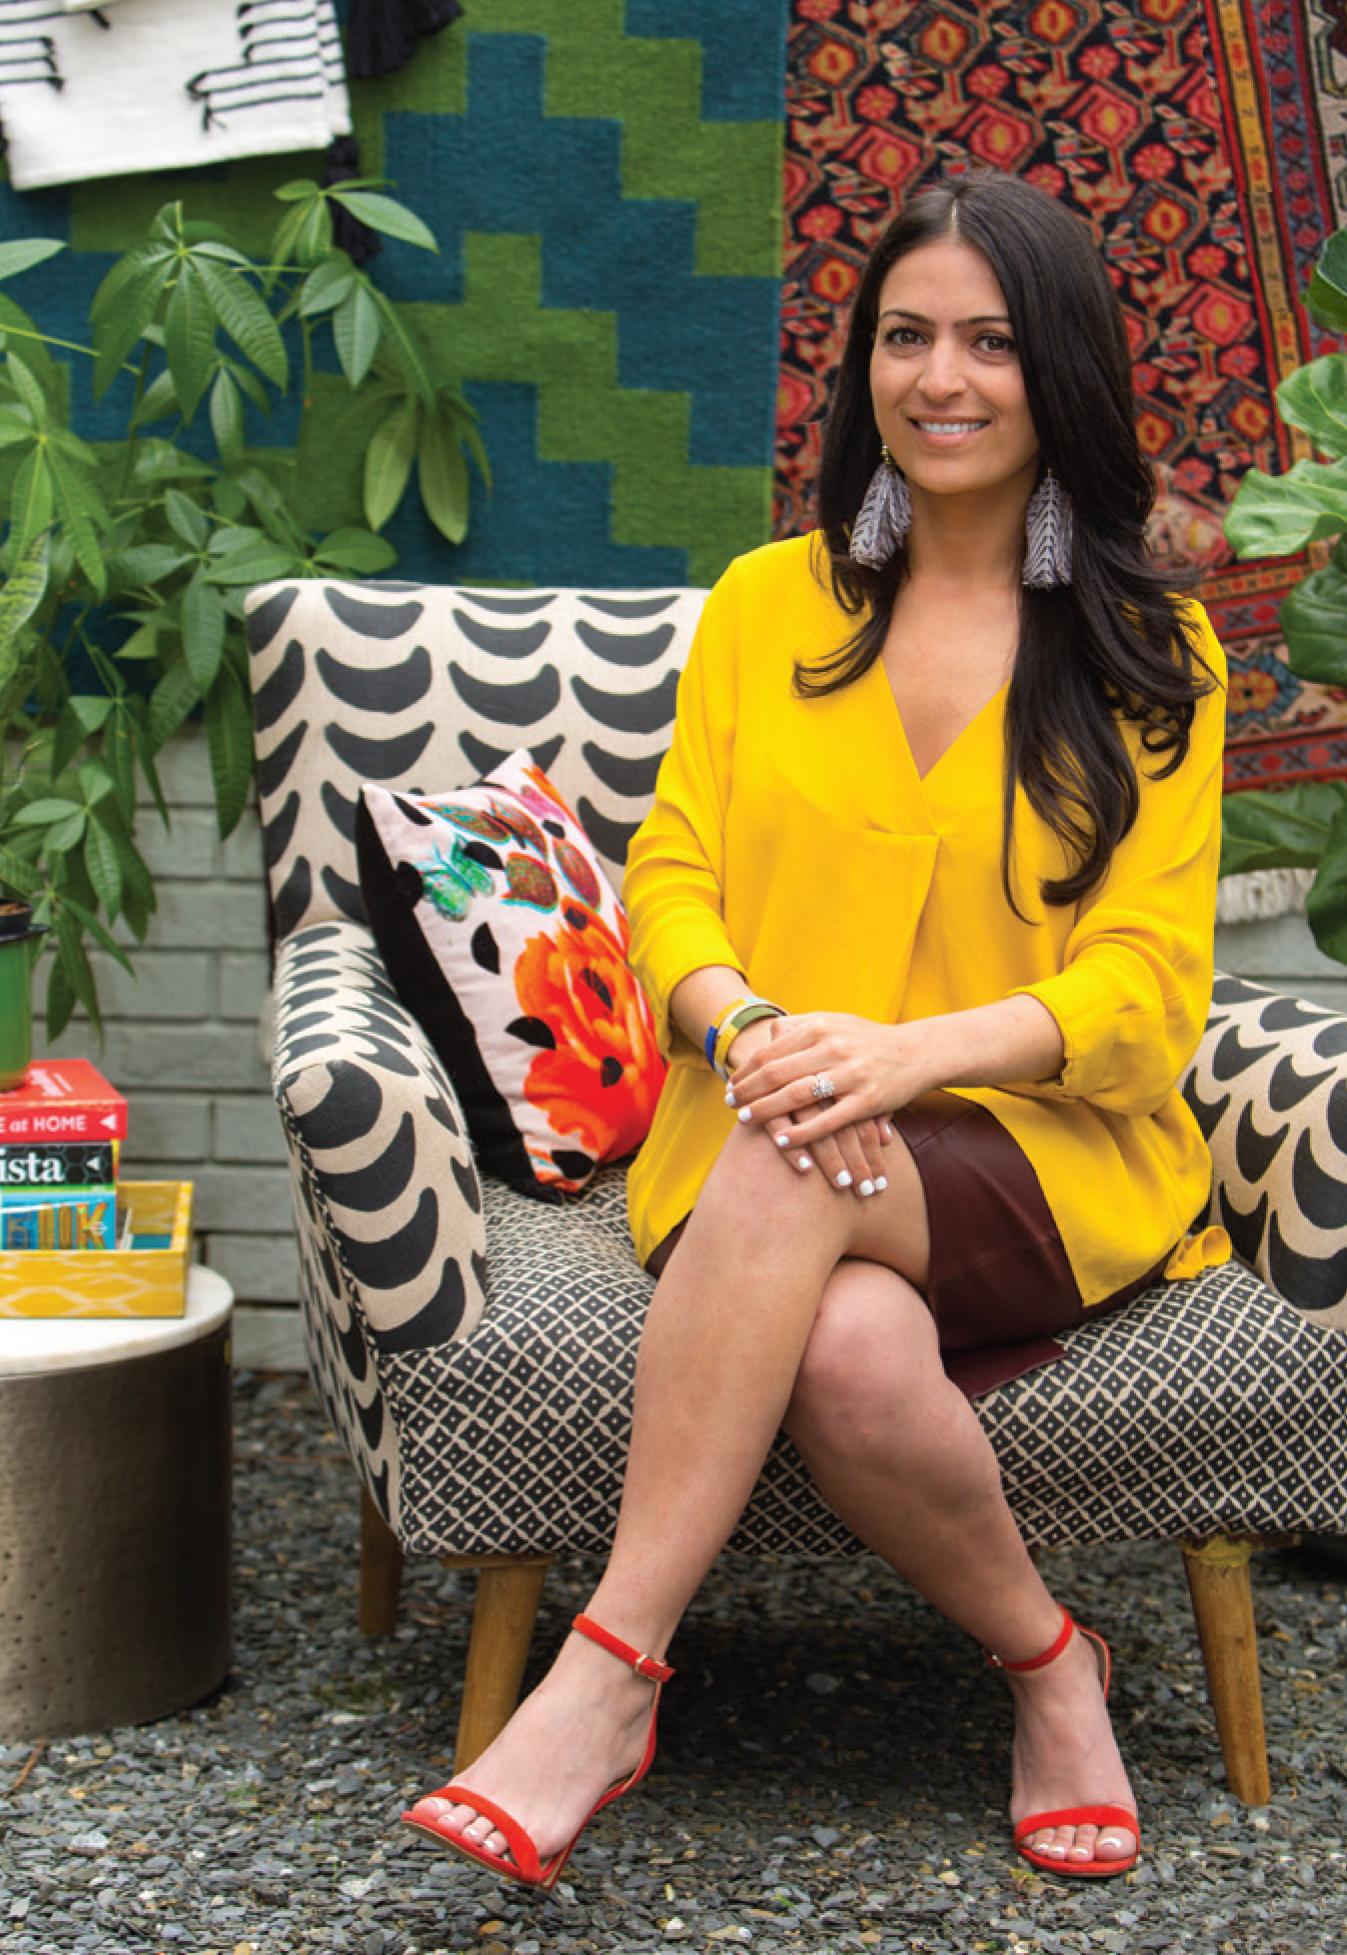 Verena Dalati Salmé from Yellow Bungalow Interior Design Studio sitting on a Anthropologie chair